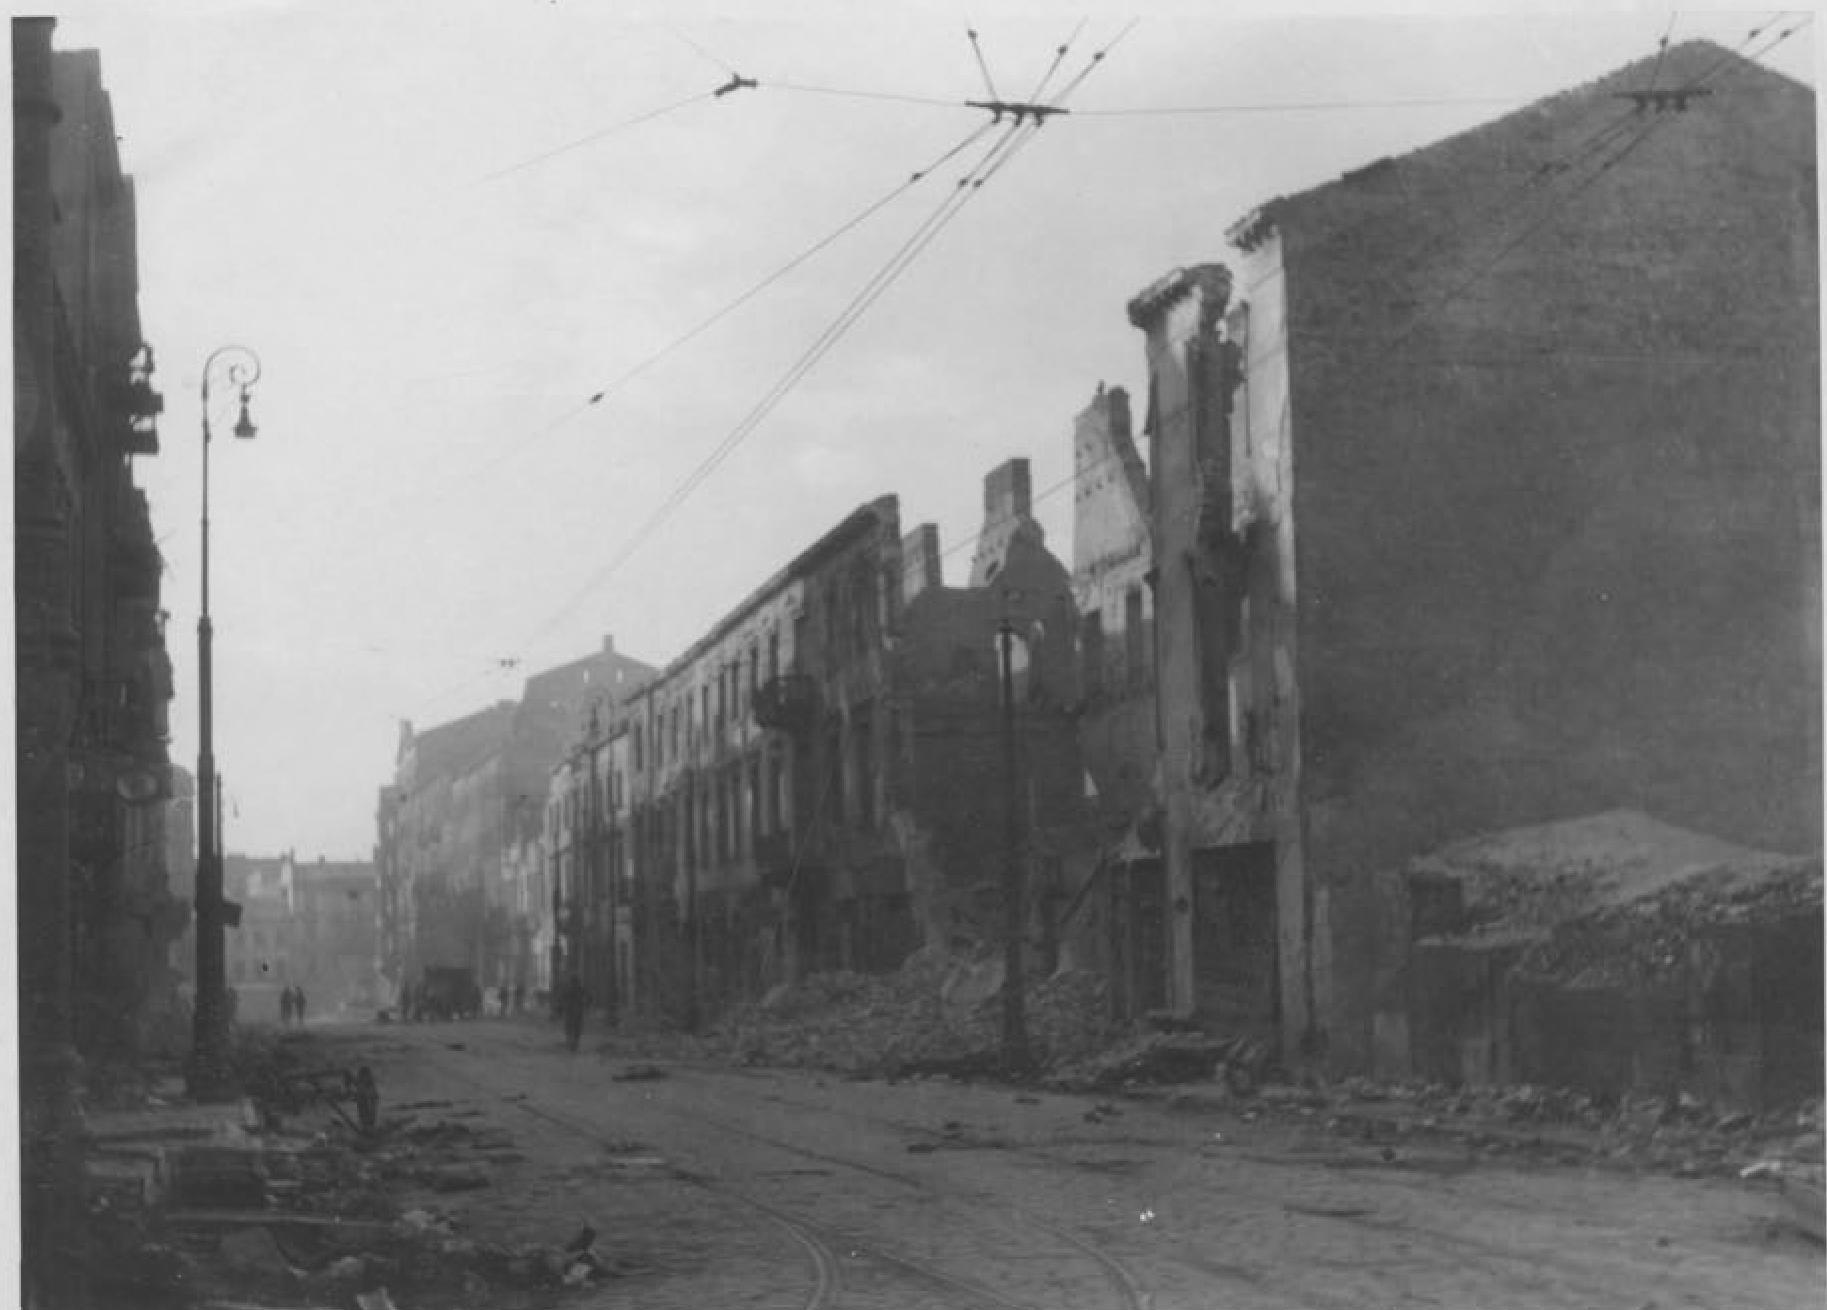 Stroop_Report_-_Warsaw_Ghetto_Uprising_-_IPN49